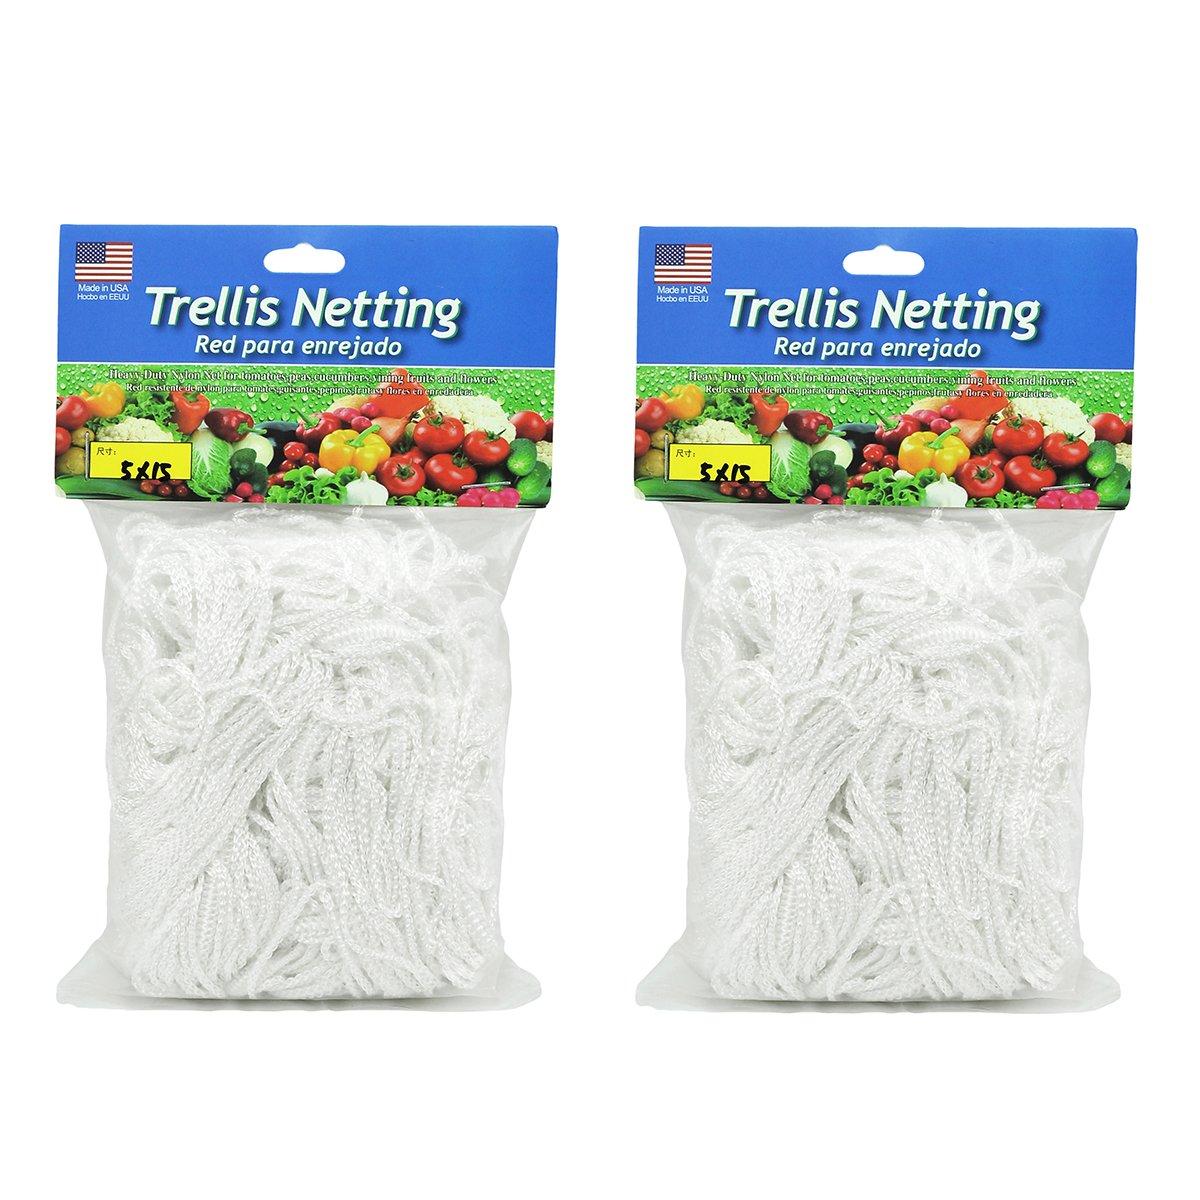 HiHydro Trellis Netting Heavy-Duty Nylon Tangle-Free White Garden Netfor Climbing, Fruits, Vegetables and Flowers (2-Pack 5'x15')